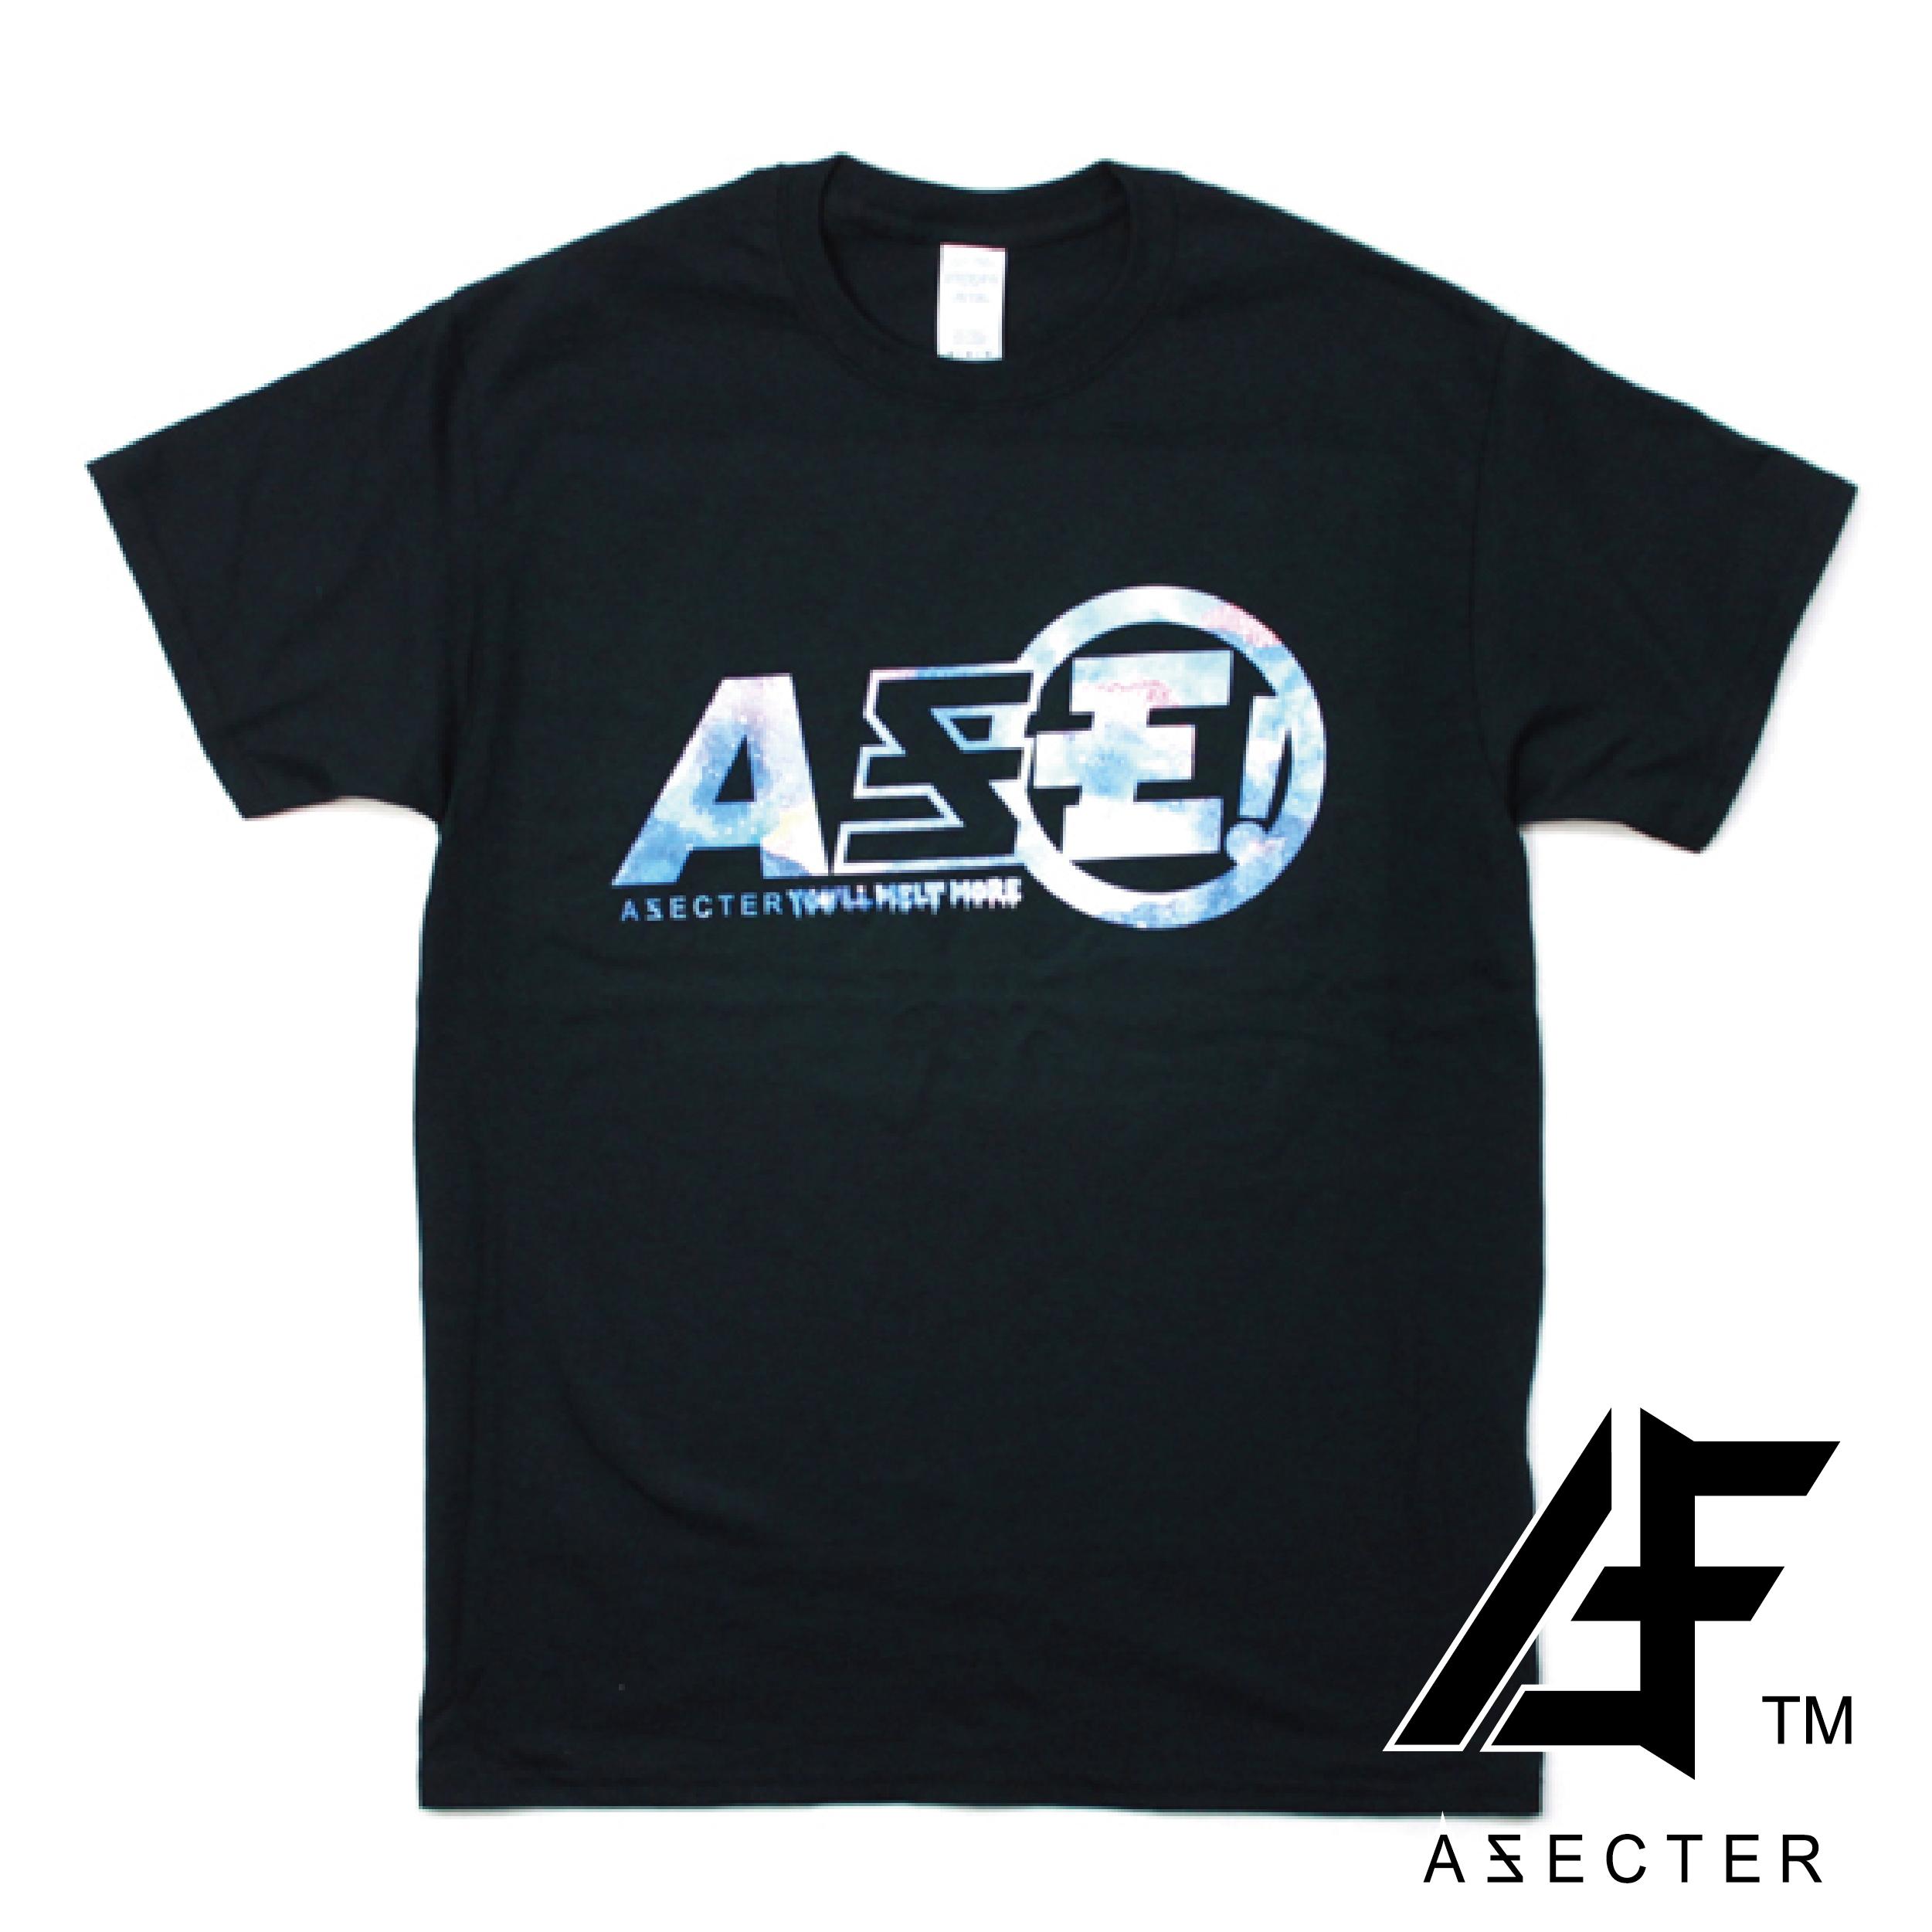 AFFECTER (アフェクター) | AFFめるモ! S/S Tee (Black)